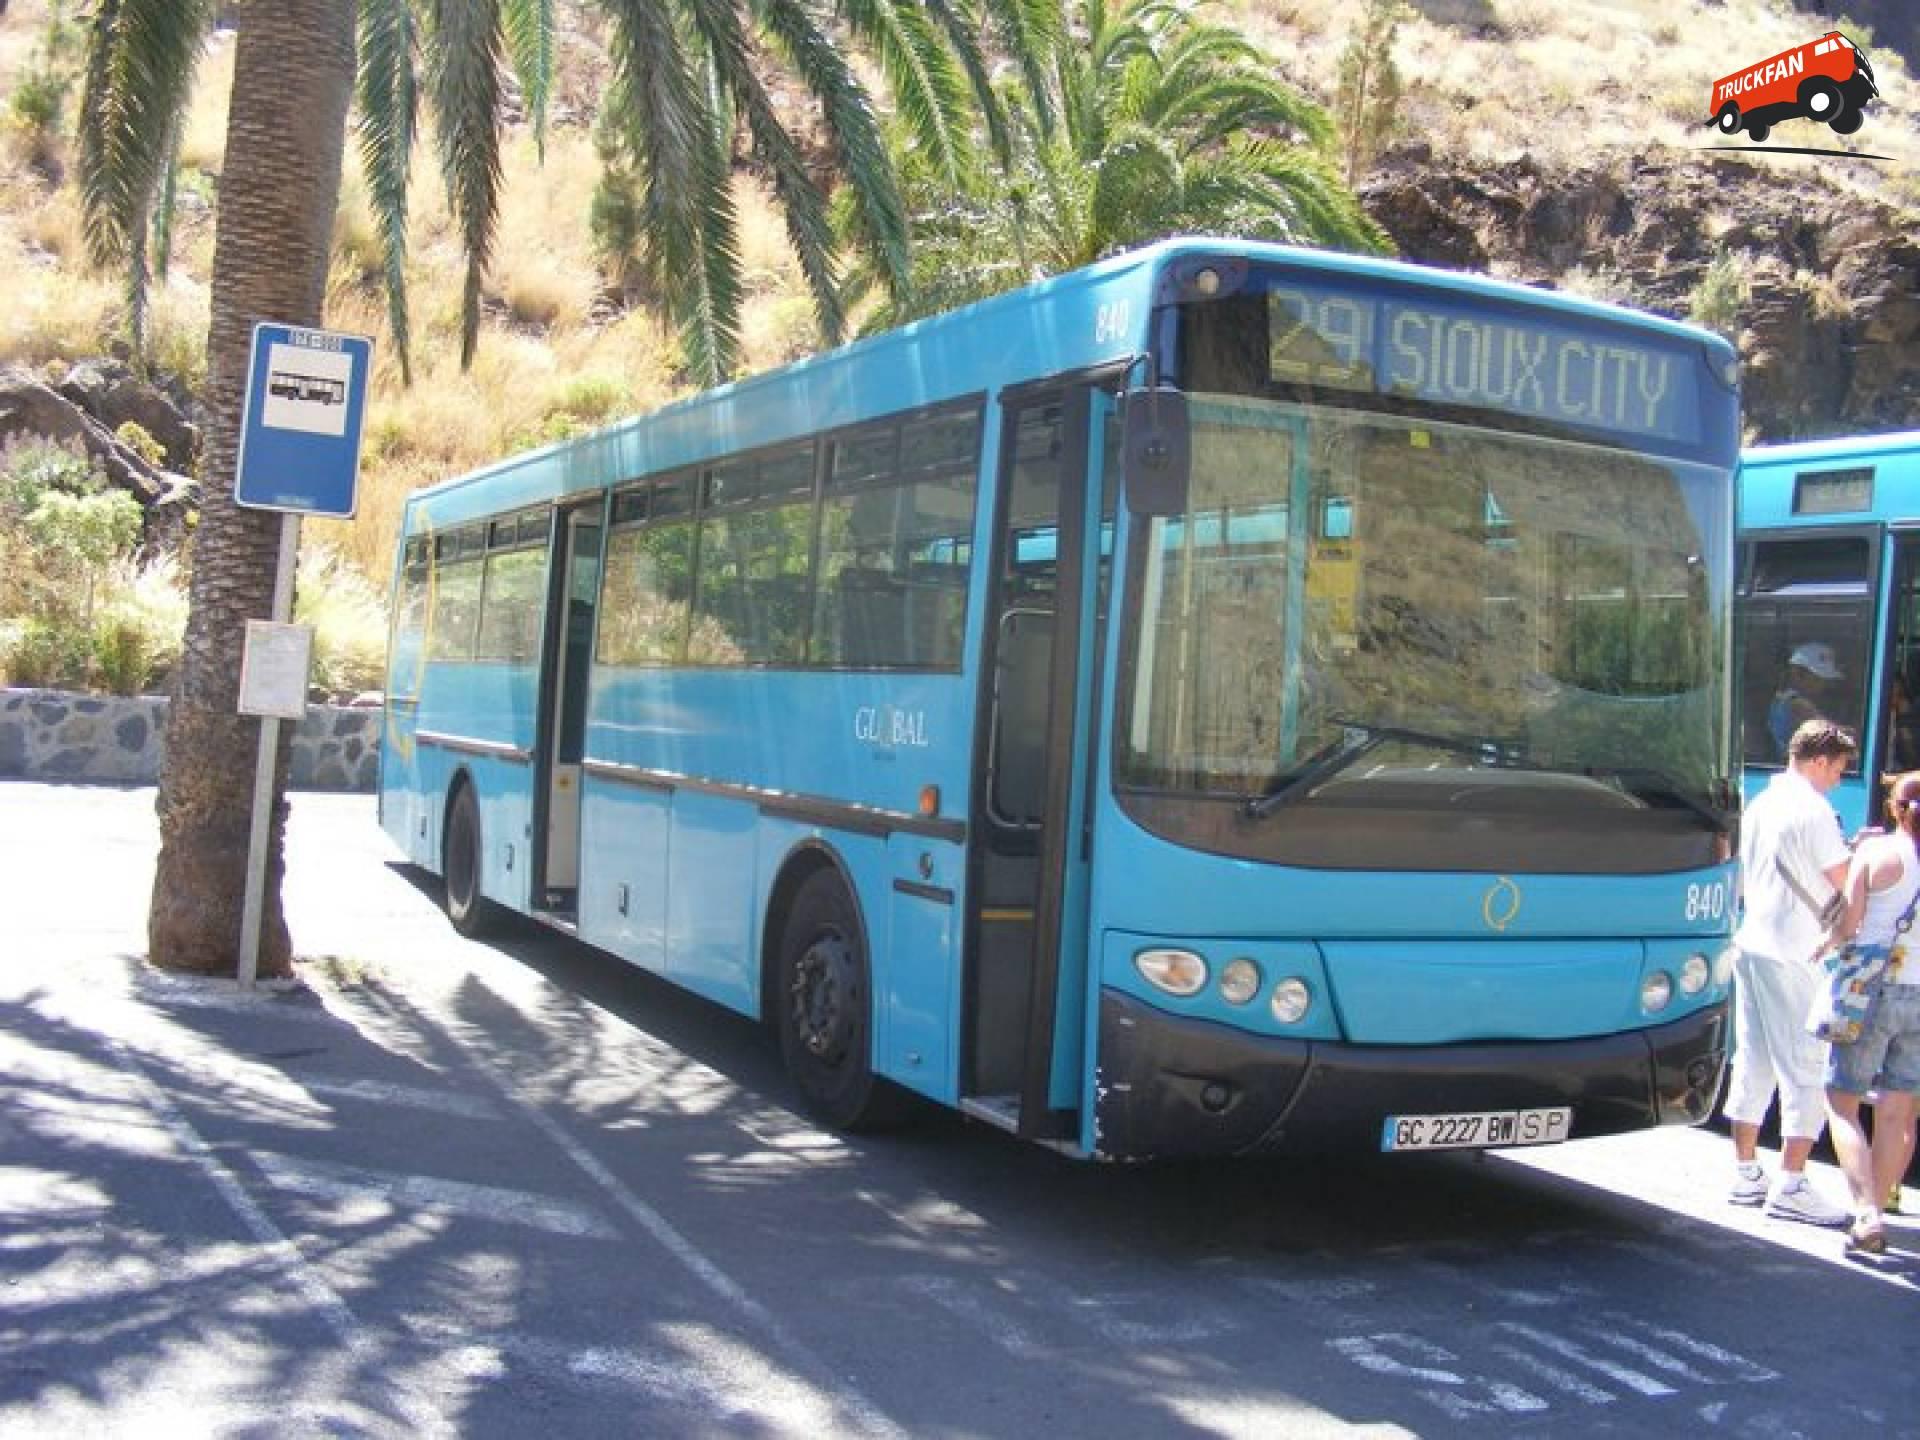 Insucar bus